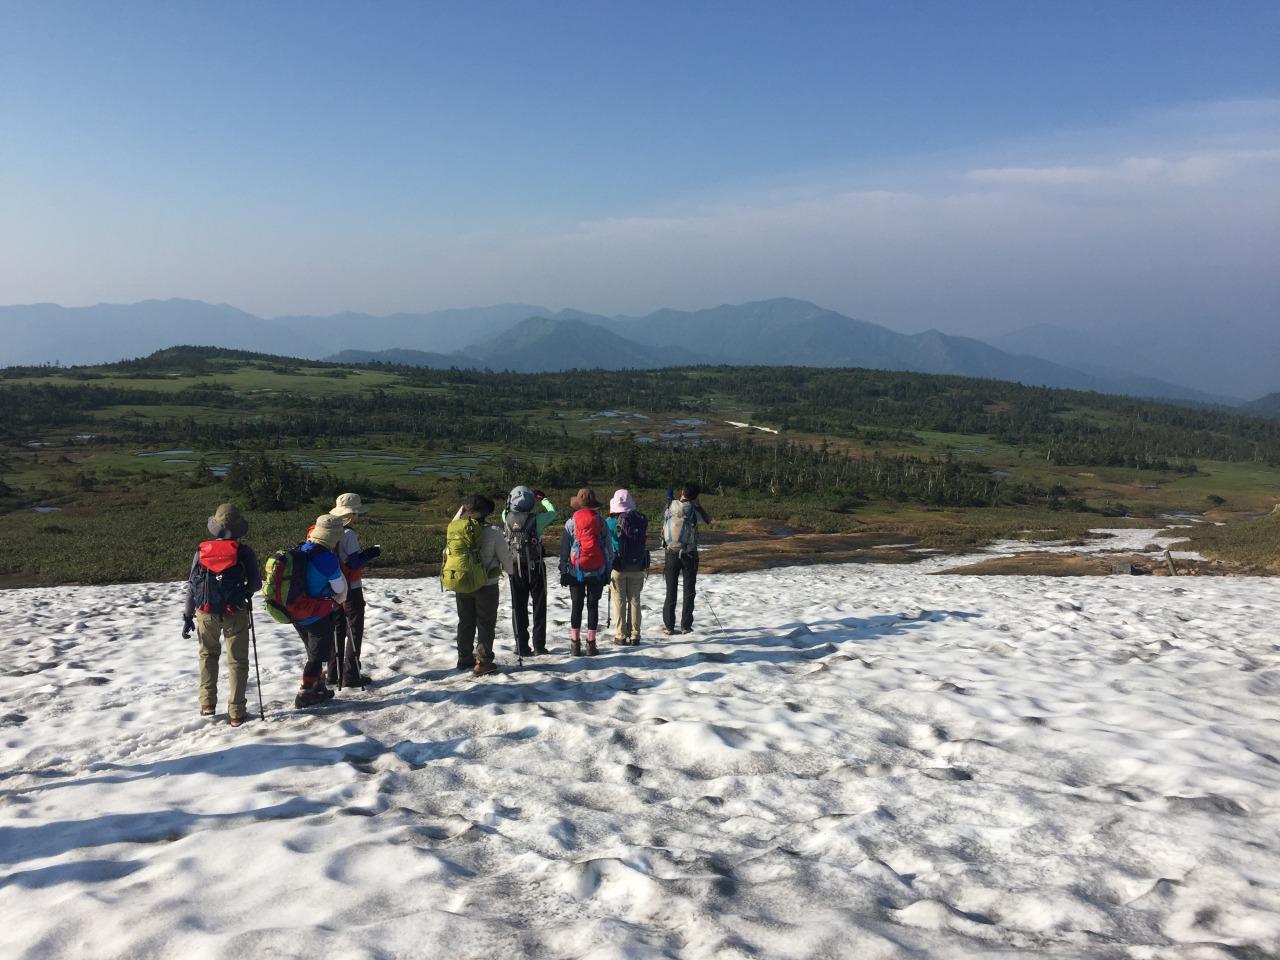 花の苗場山縦走と日本の原風景、松之山温泉3日間